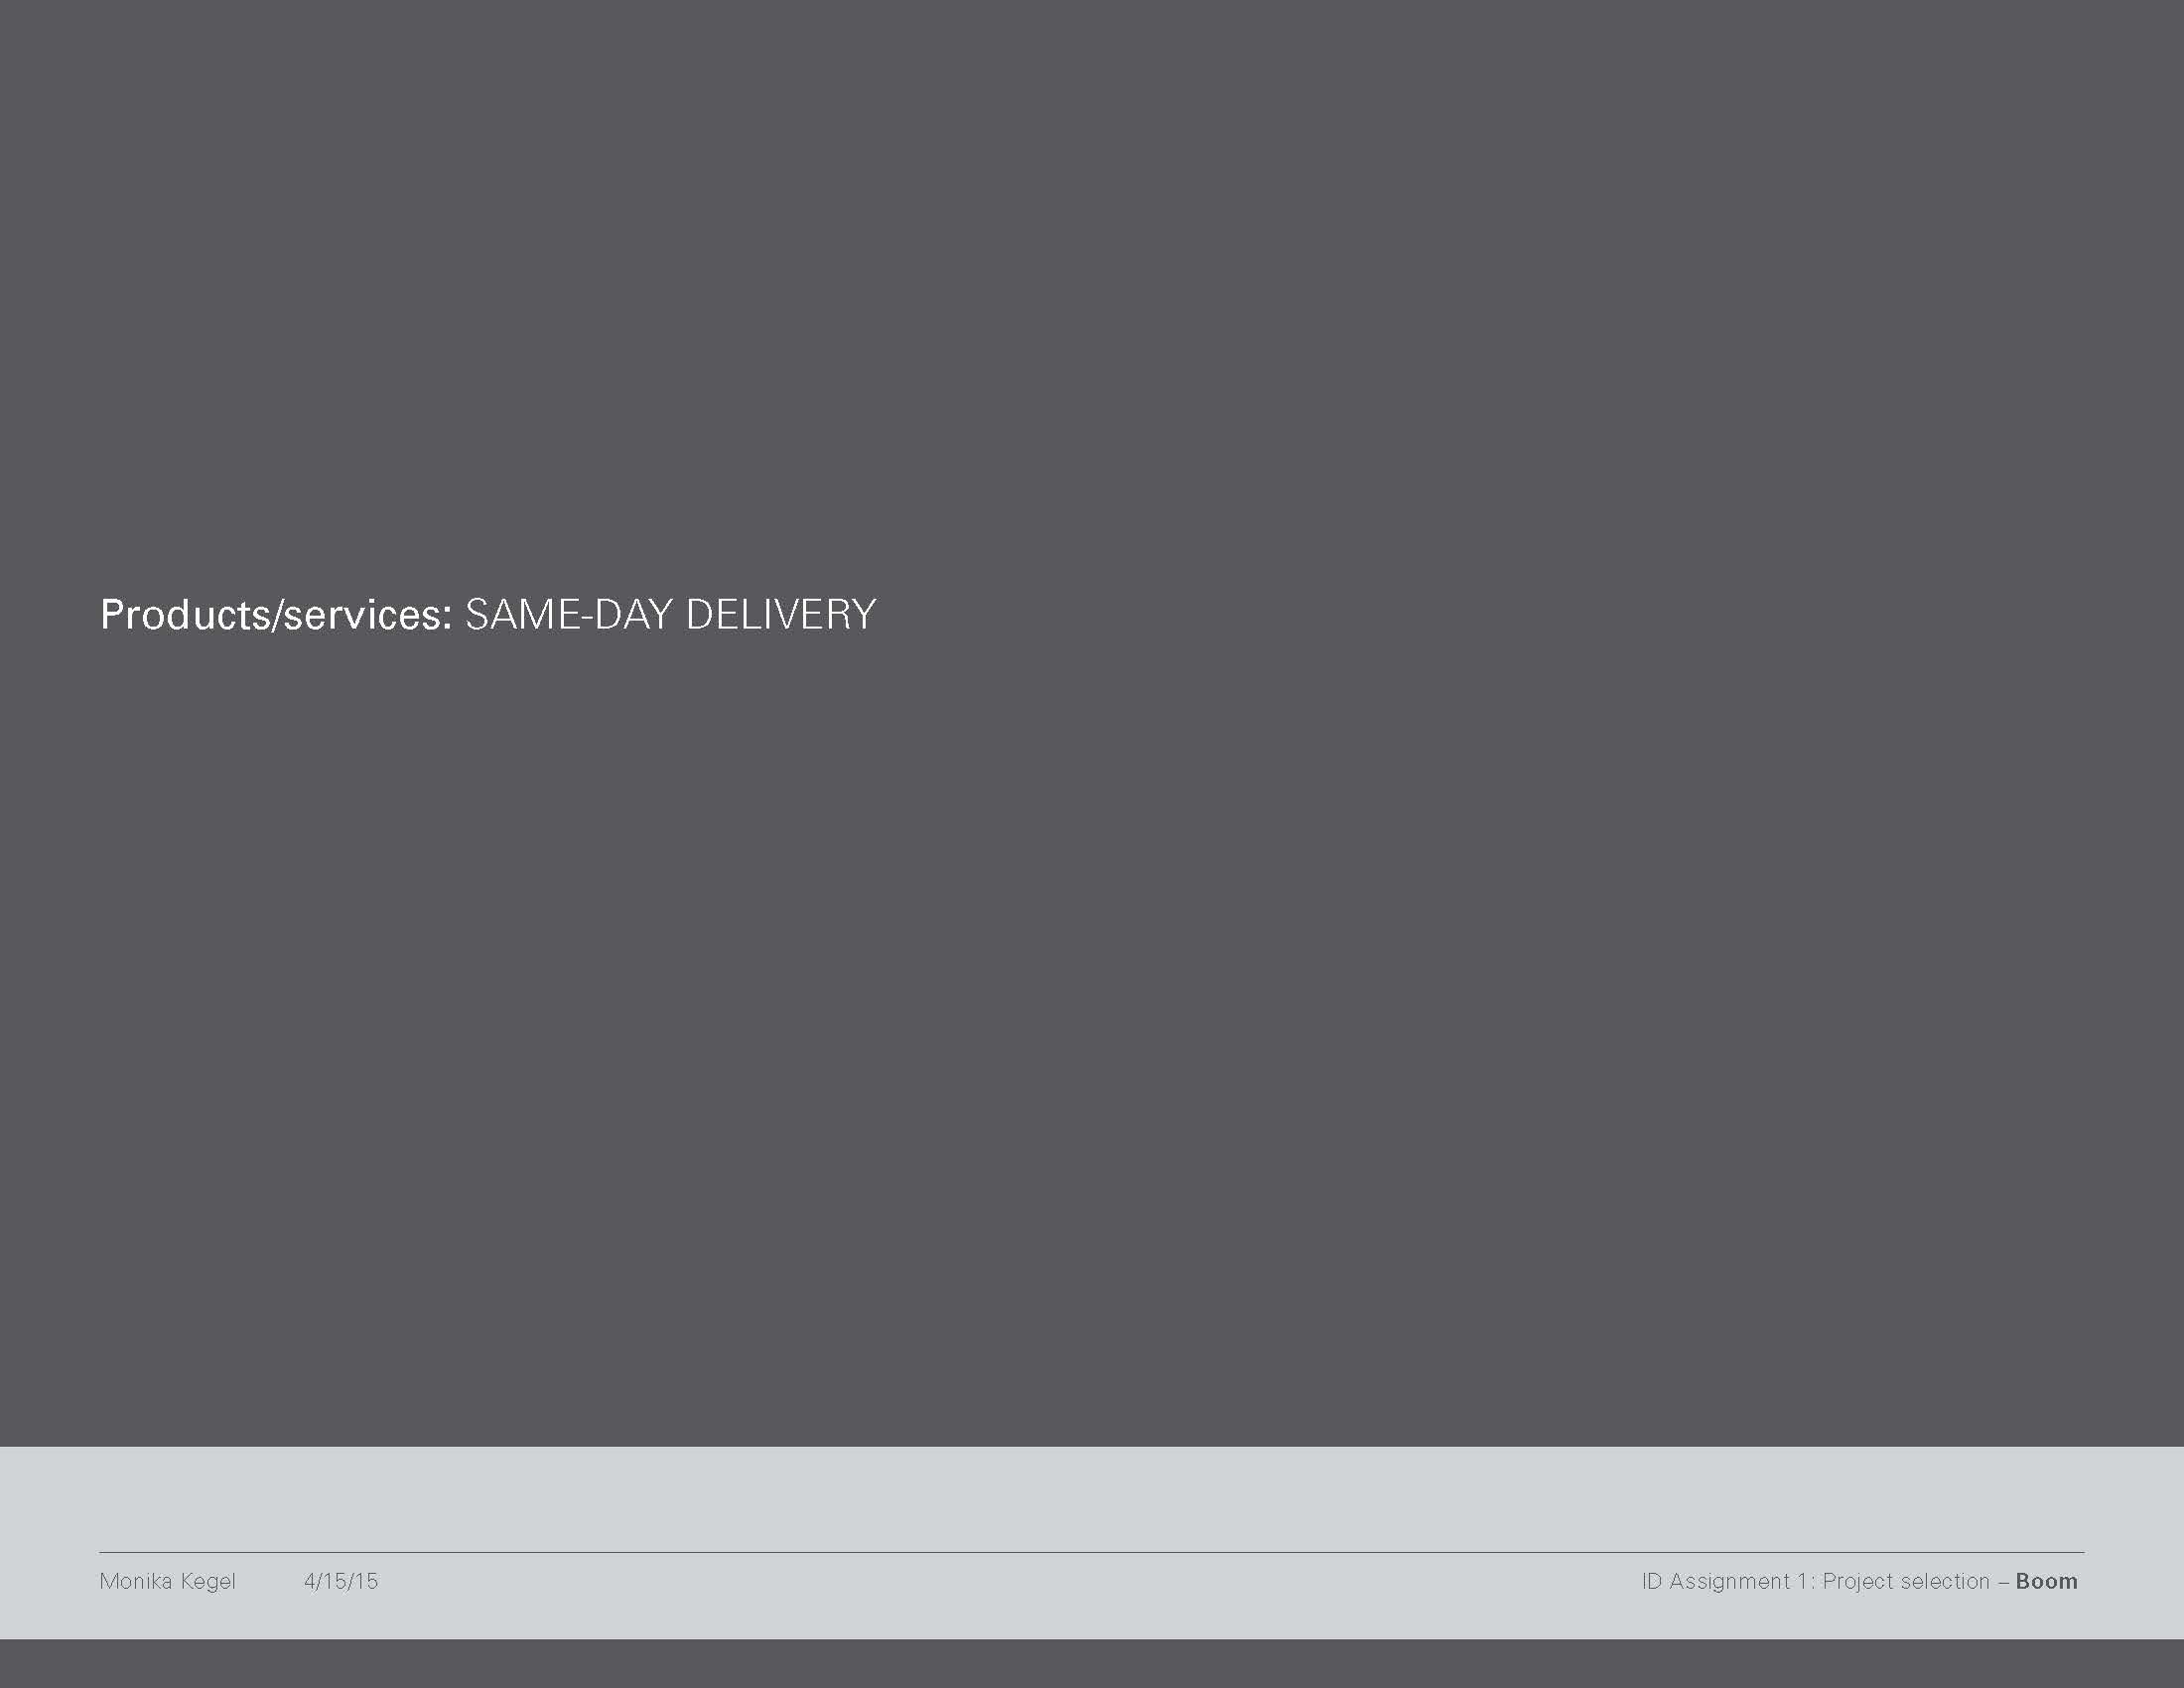 Kegel_Assignment1_ID_Page_07.jpg